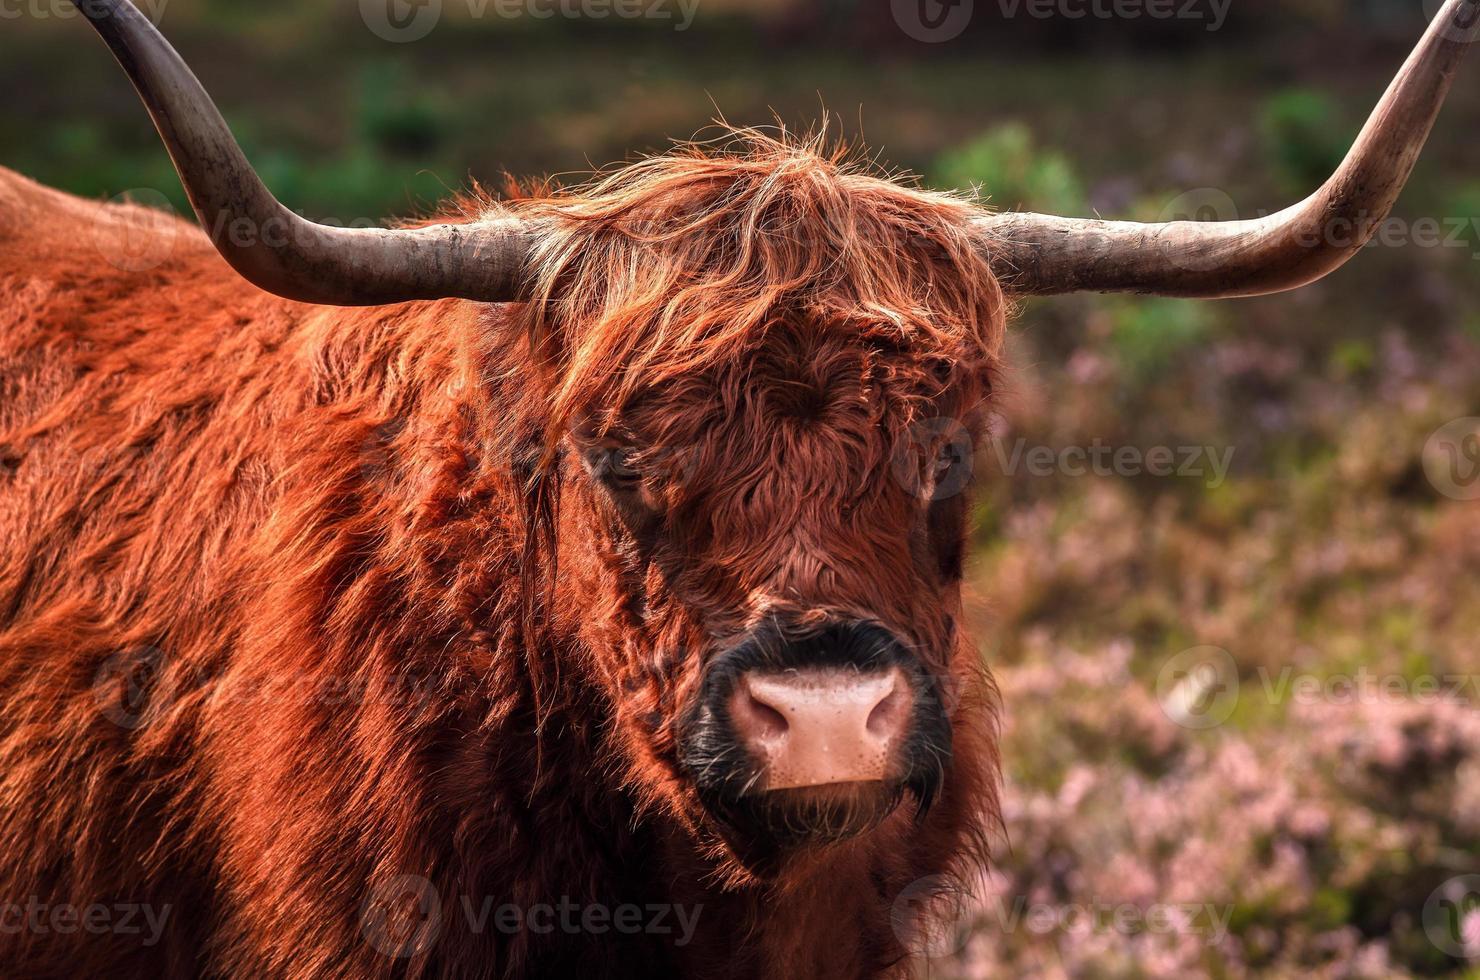 hoogland koe foto